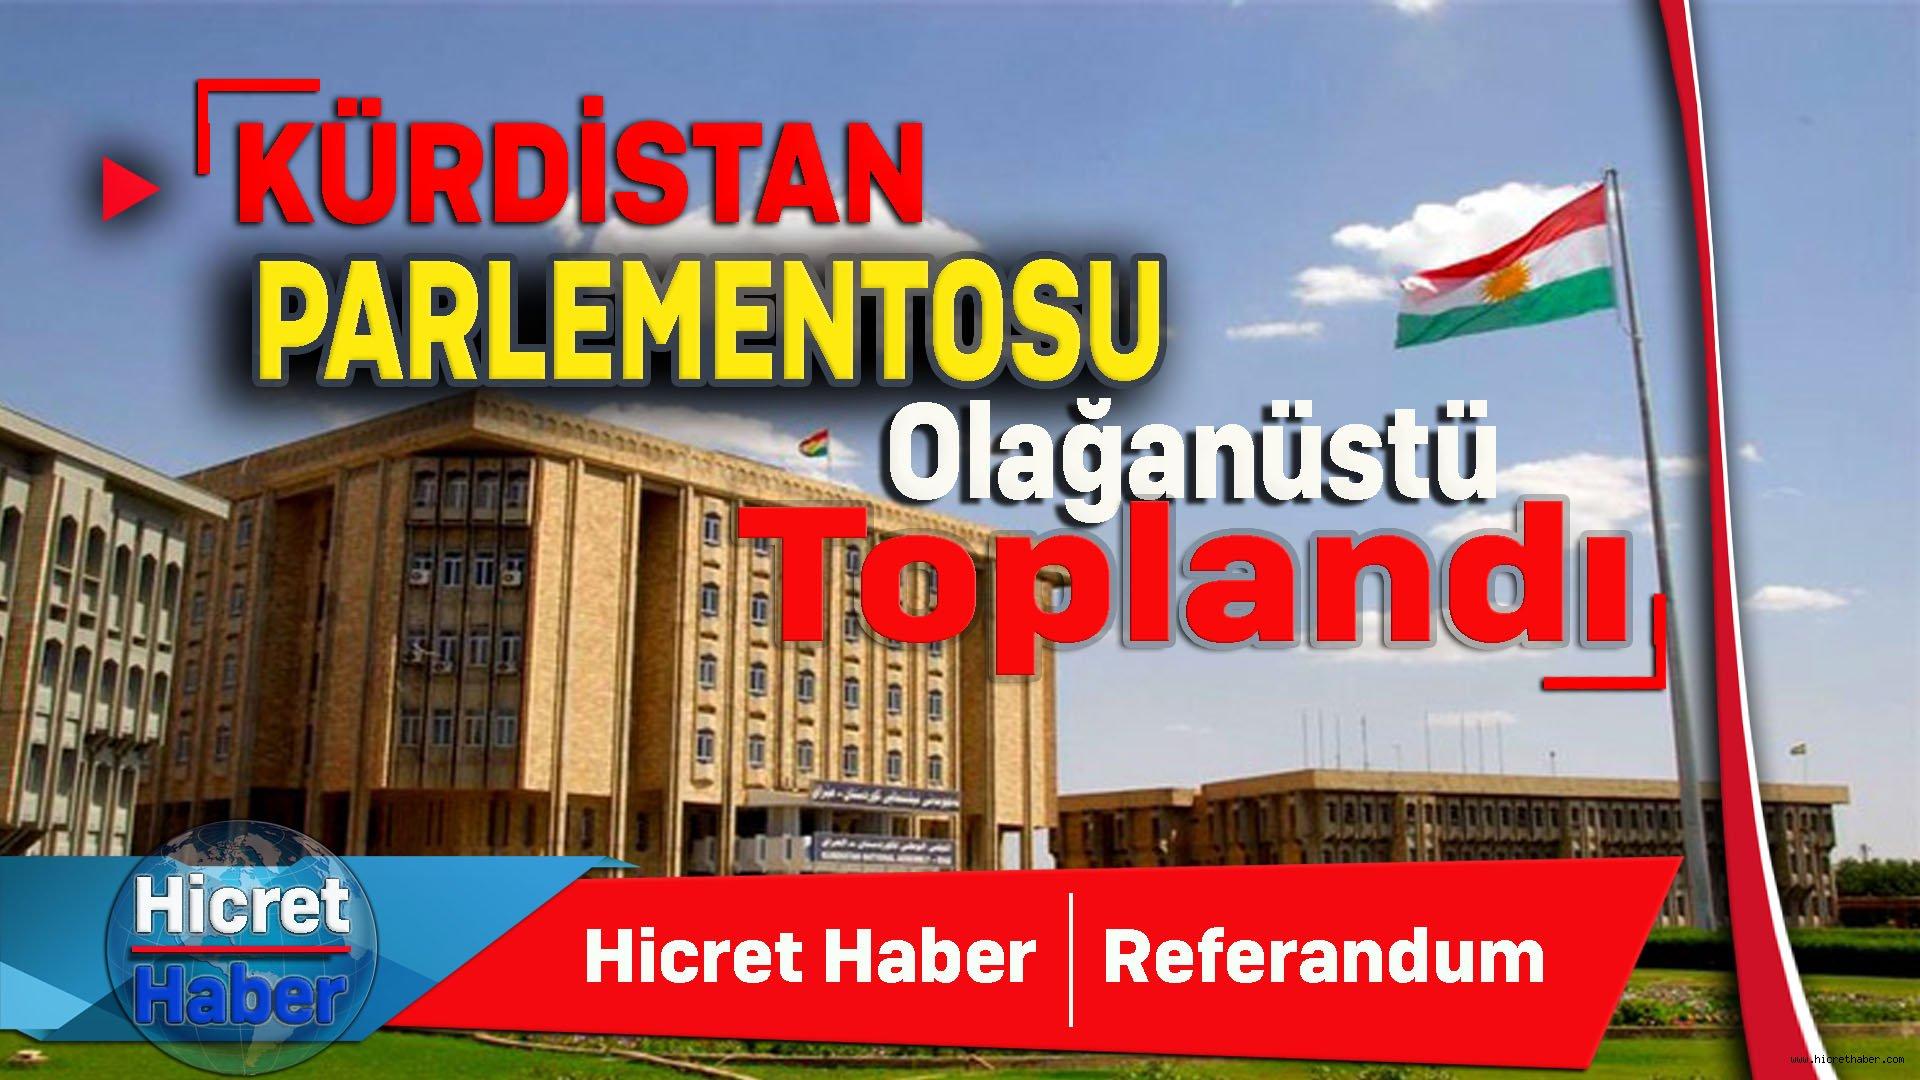 Kürdistan Olağanüstü Toplandı